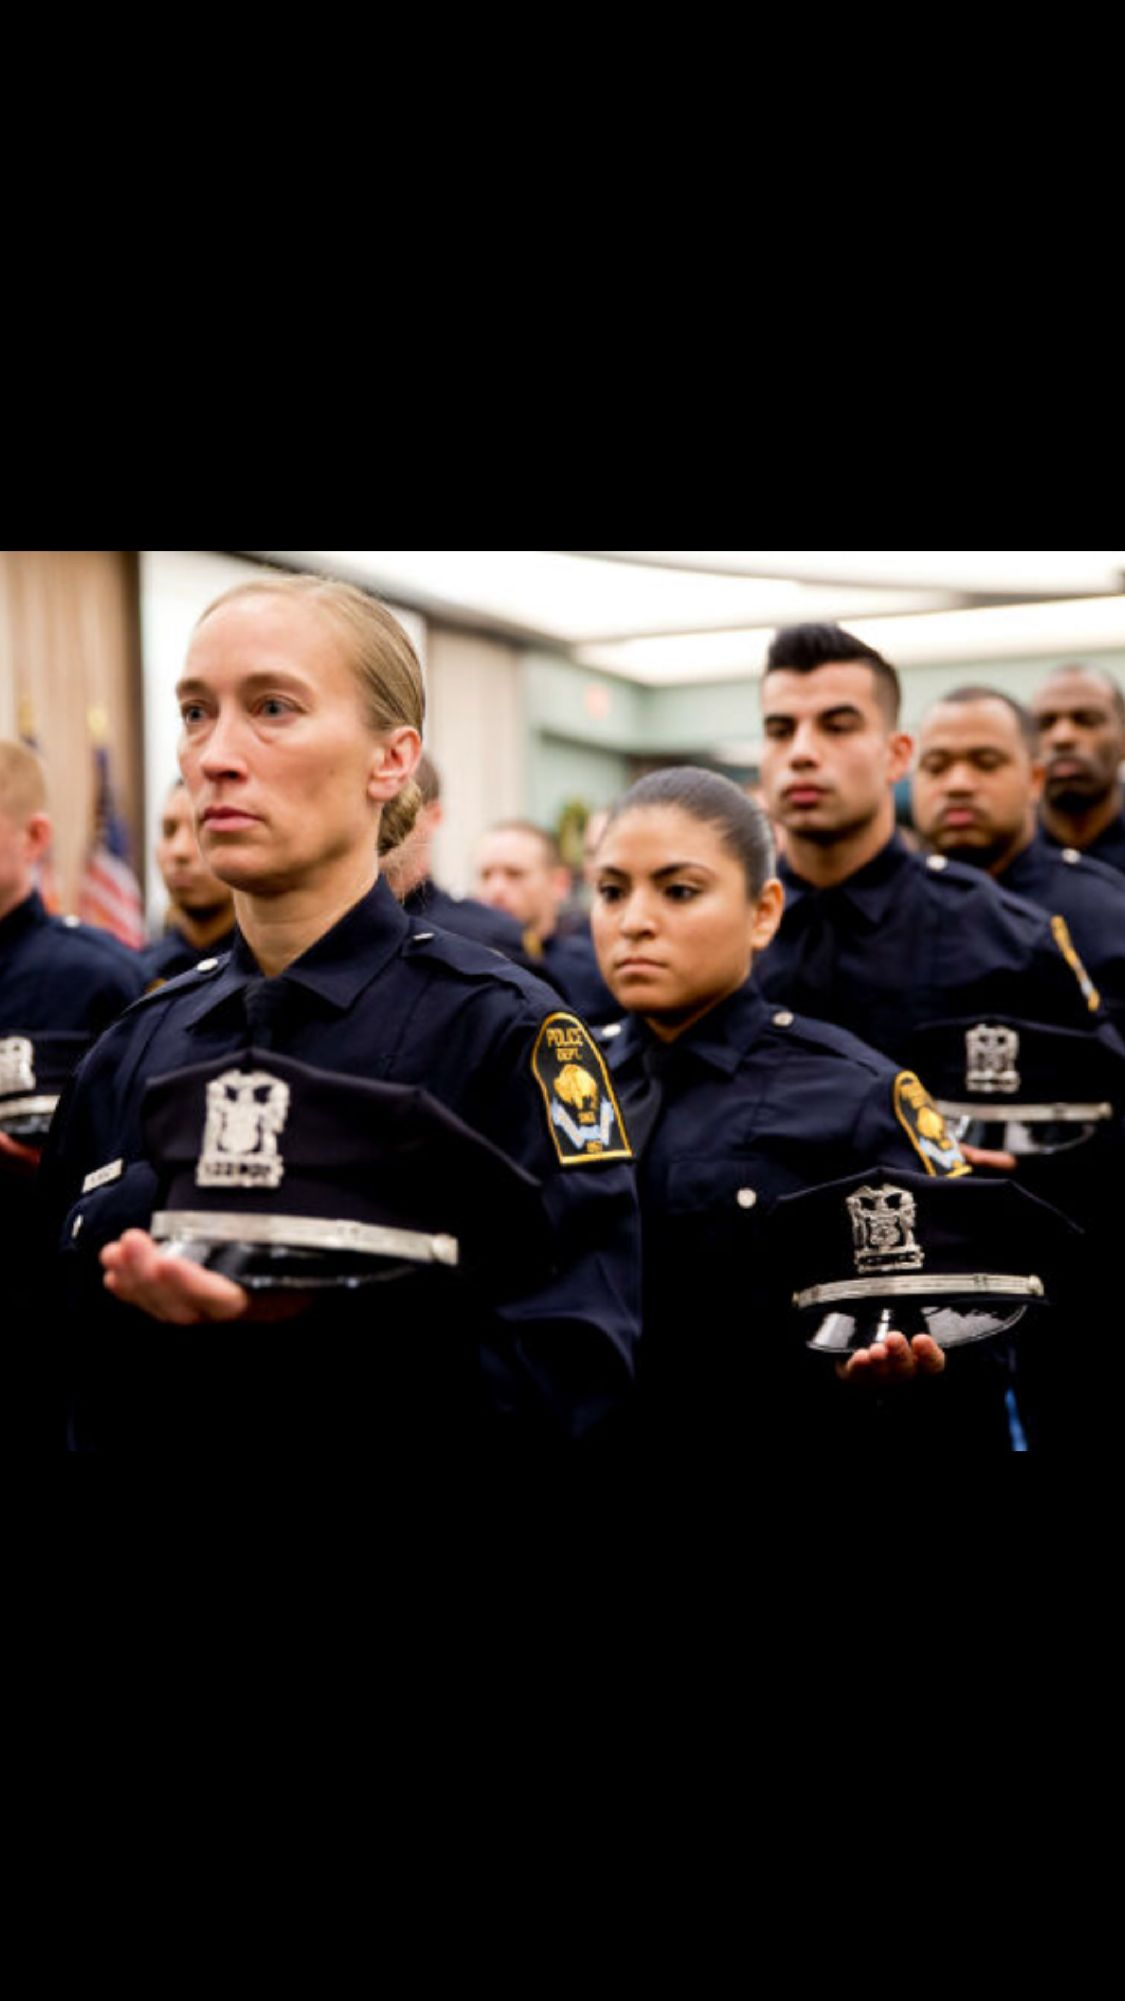 Recruit Graduation Police Police Department Think Tank